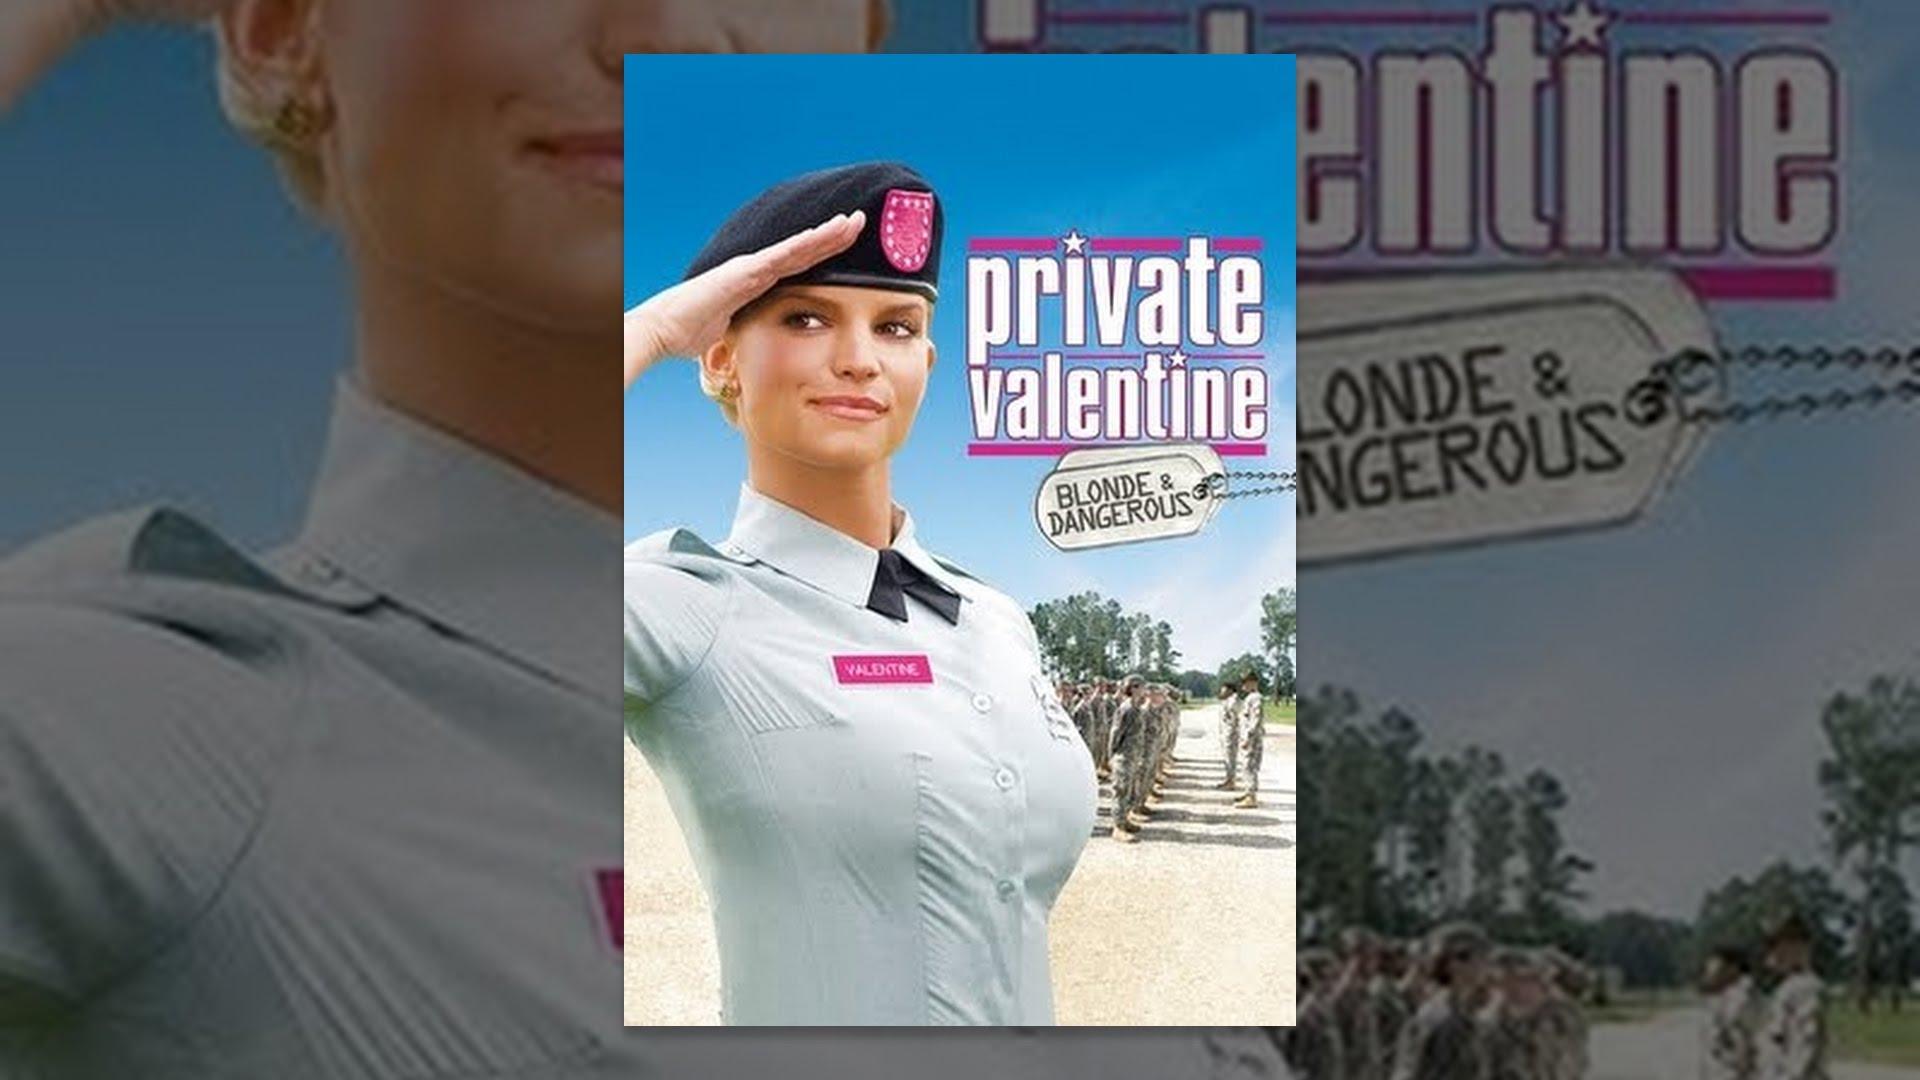 Private valentine cast